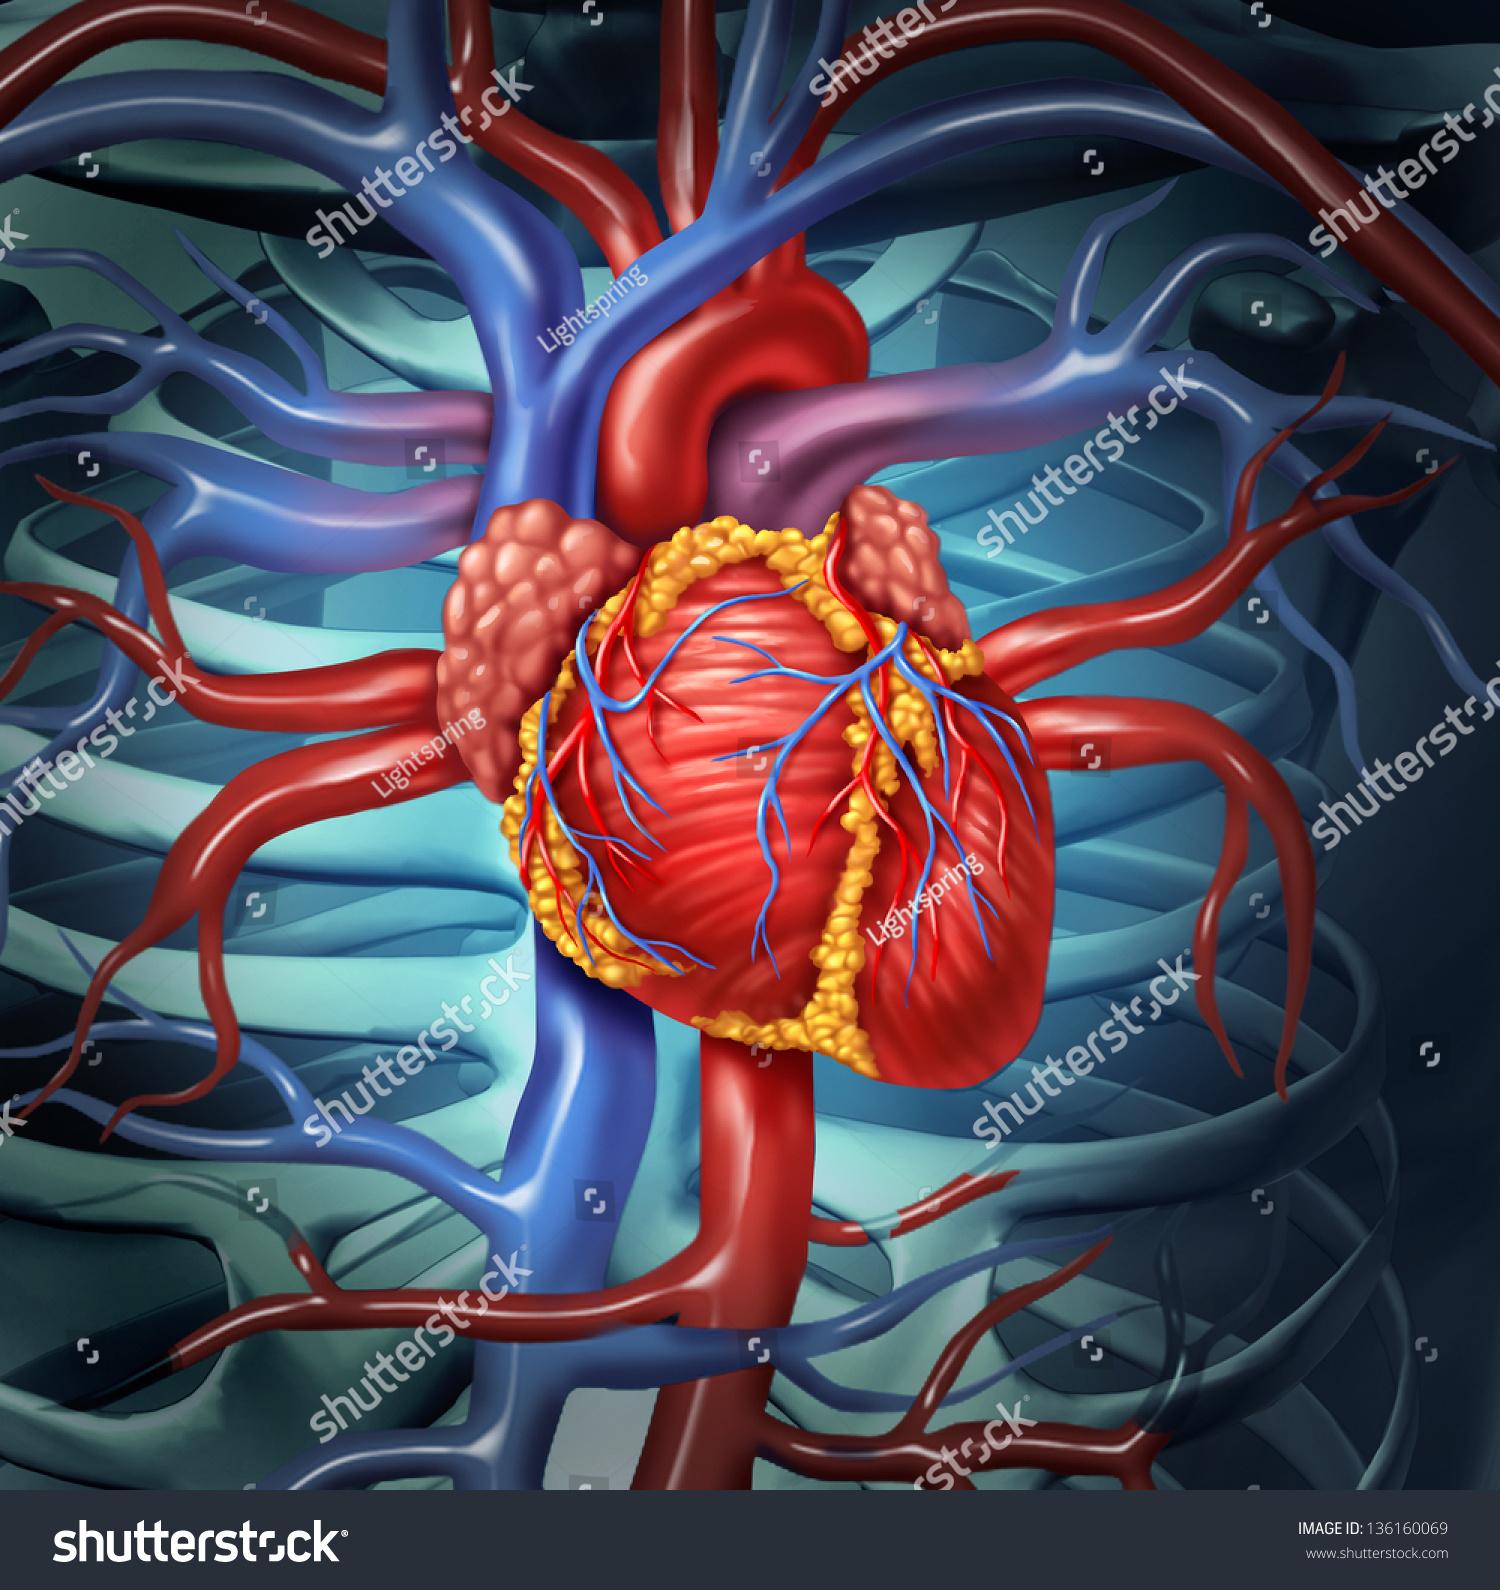 cardiovascular human heart anatomy healthy body stock illustration, Muscles